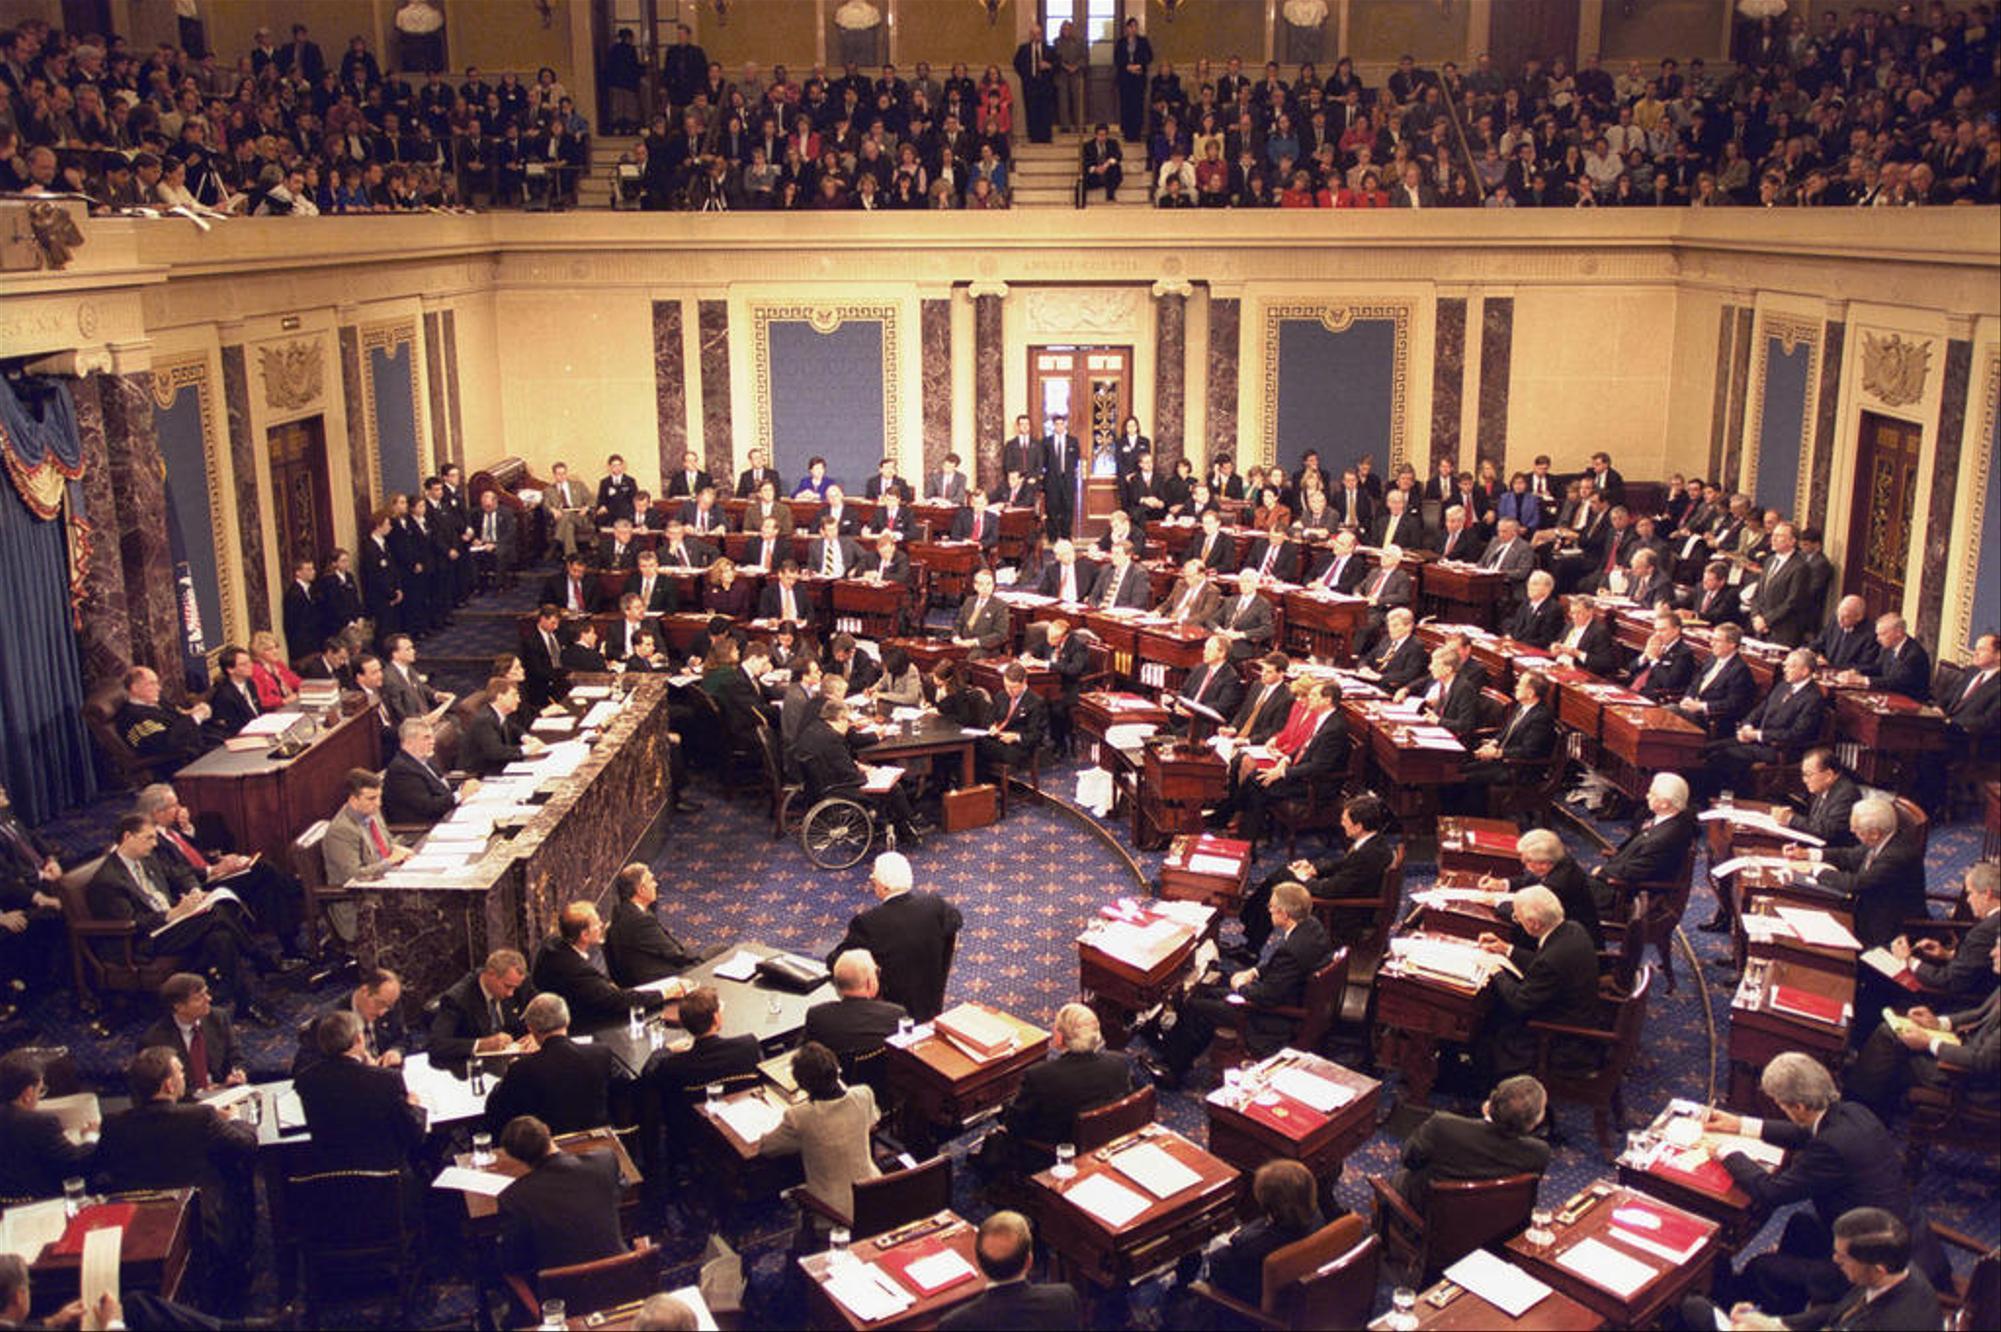 File:Senate in session.jpg